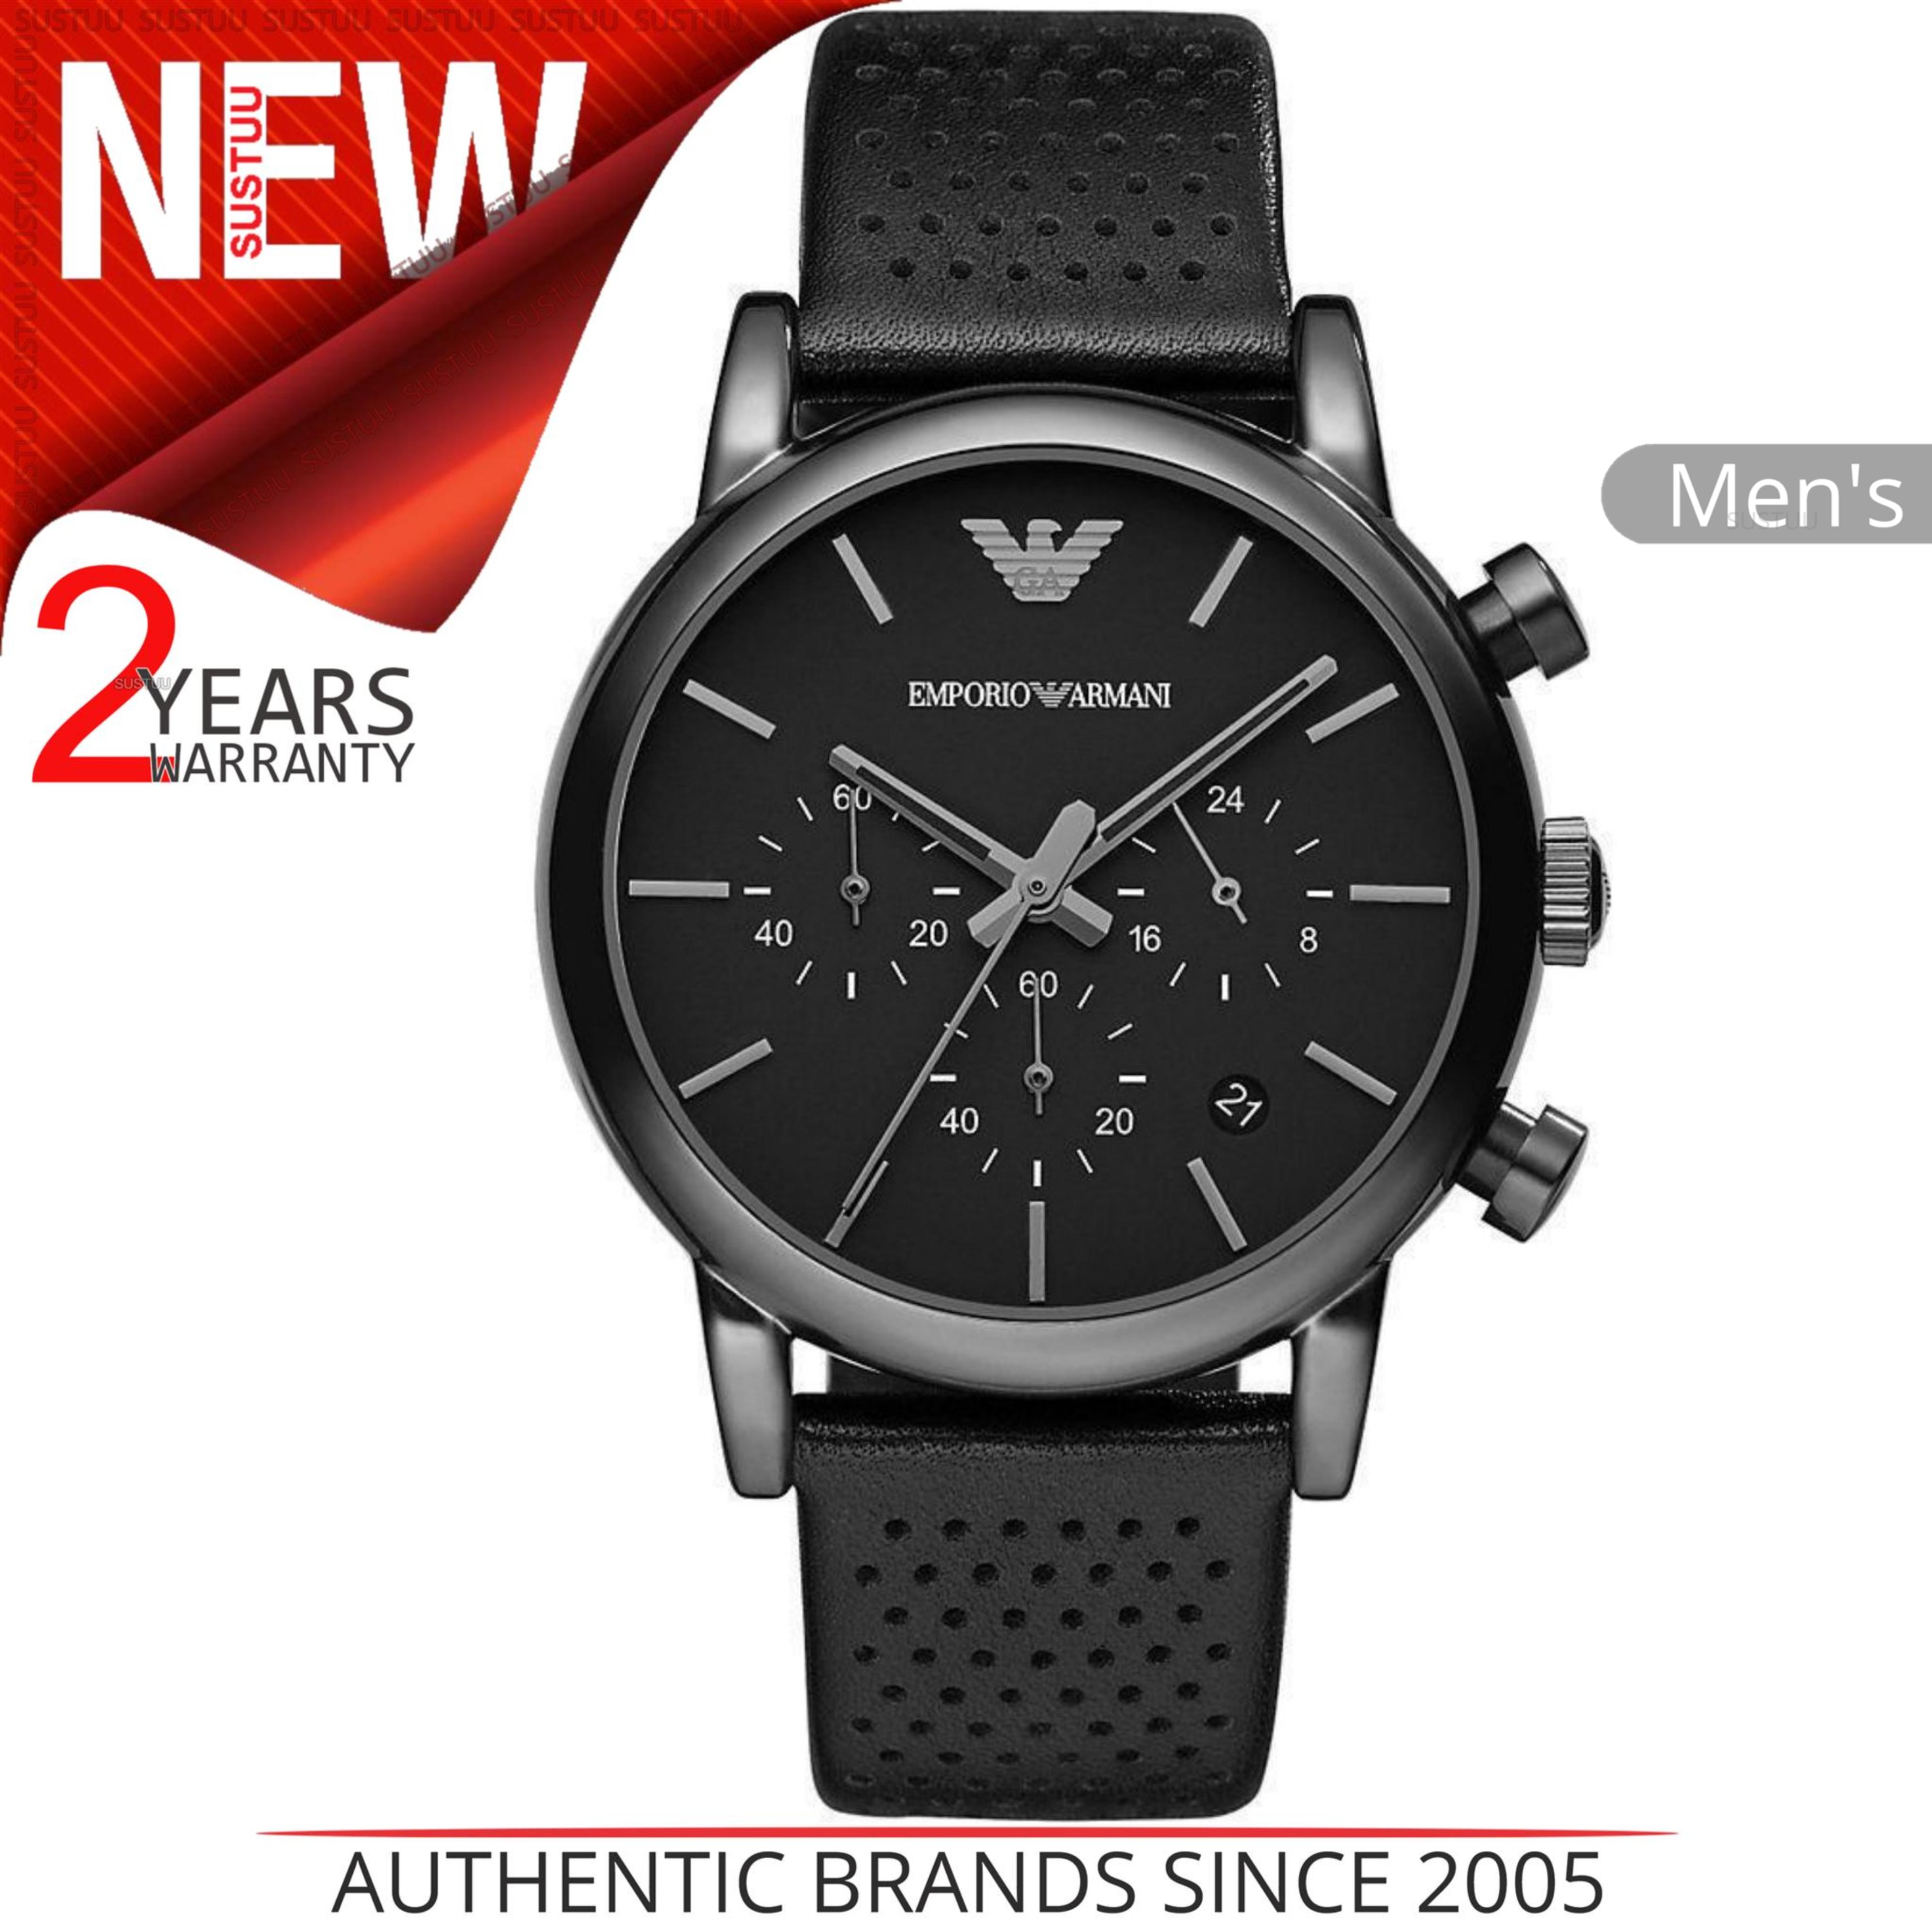 8e573851810fb Details about Emporio Armani Classic Men s Watch│Black Chronograph  Dial│Leather Strap│AR1737